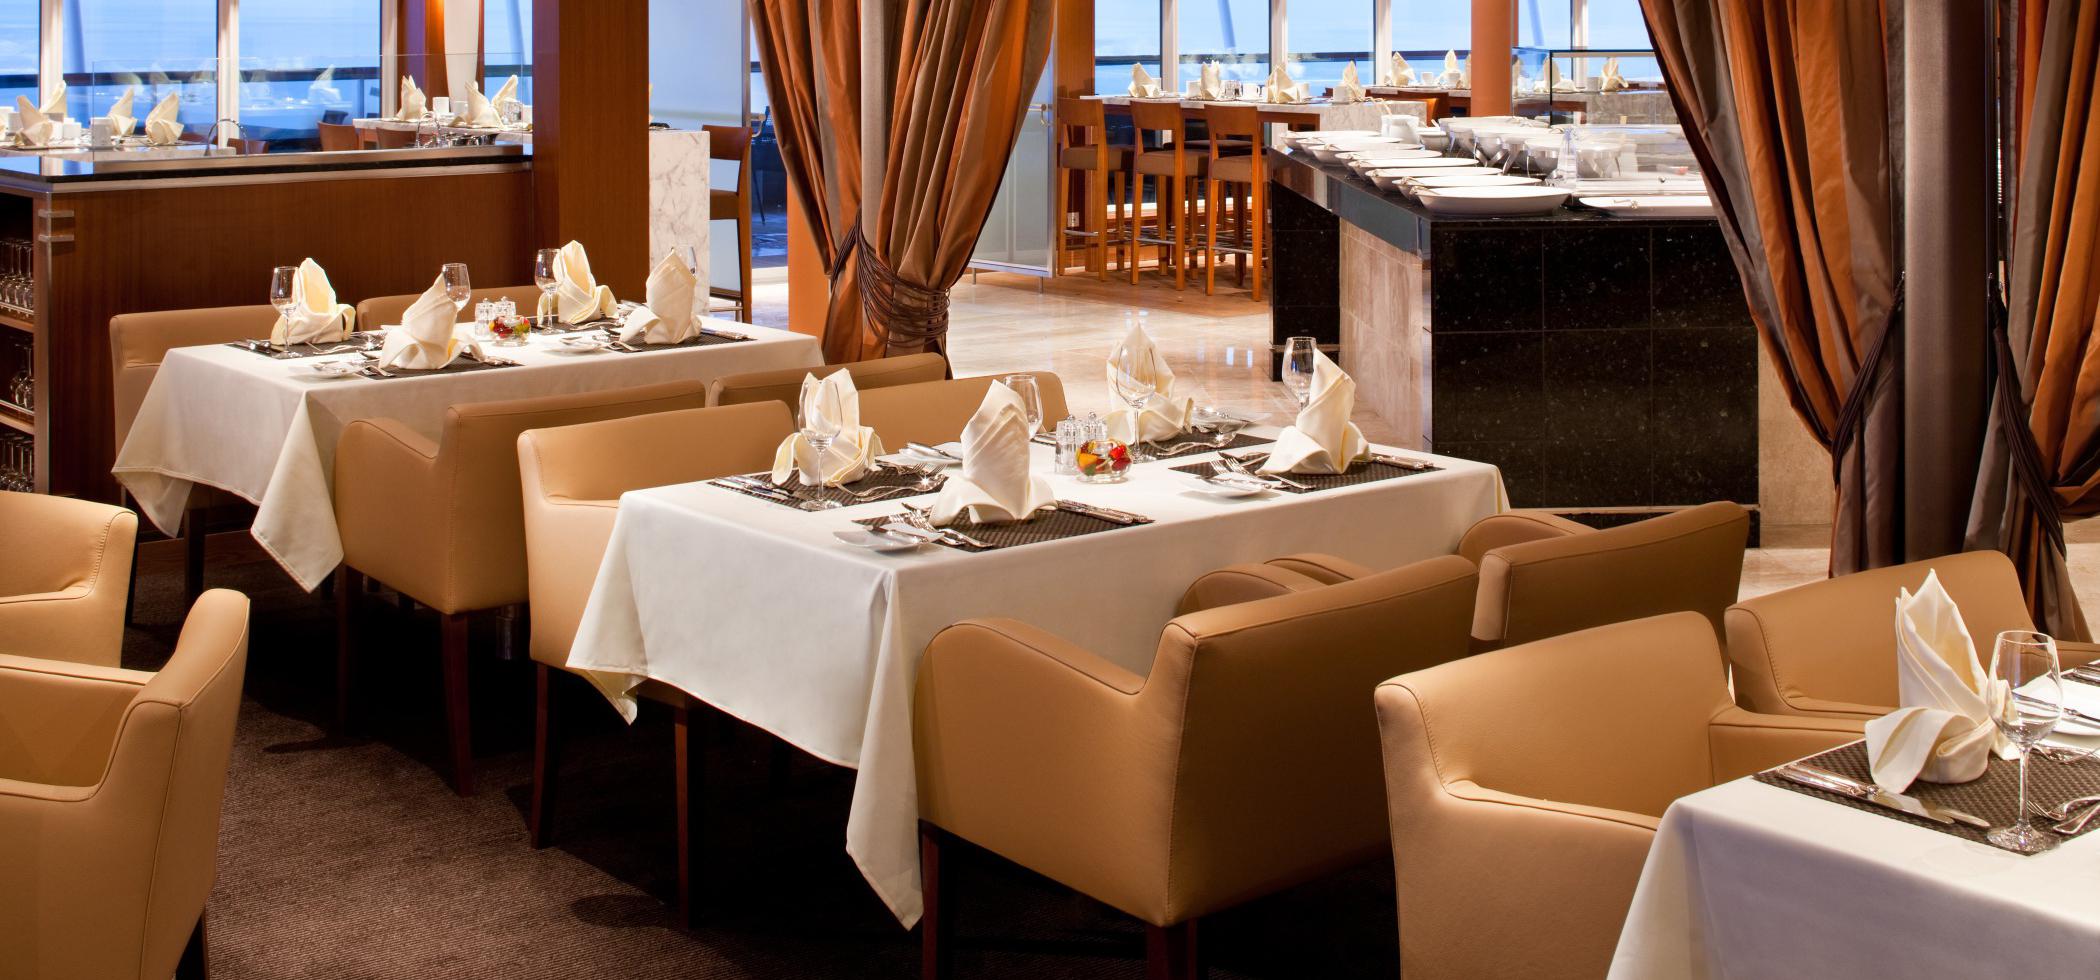 Seabourn Restaurant The Colonnade